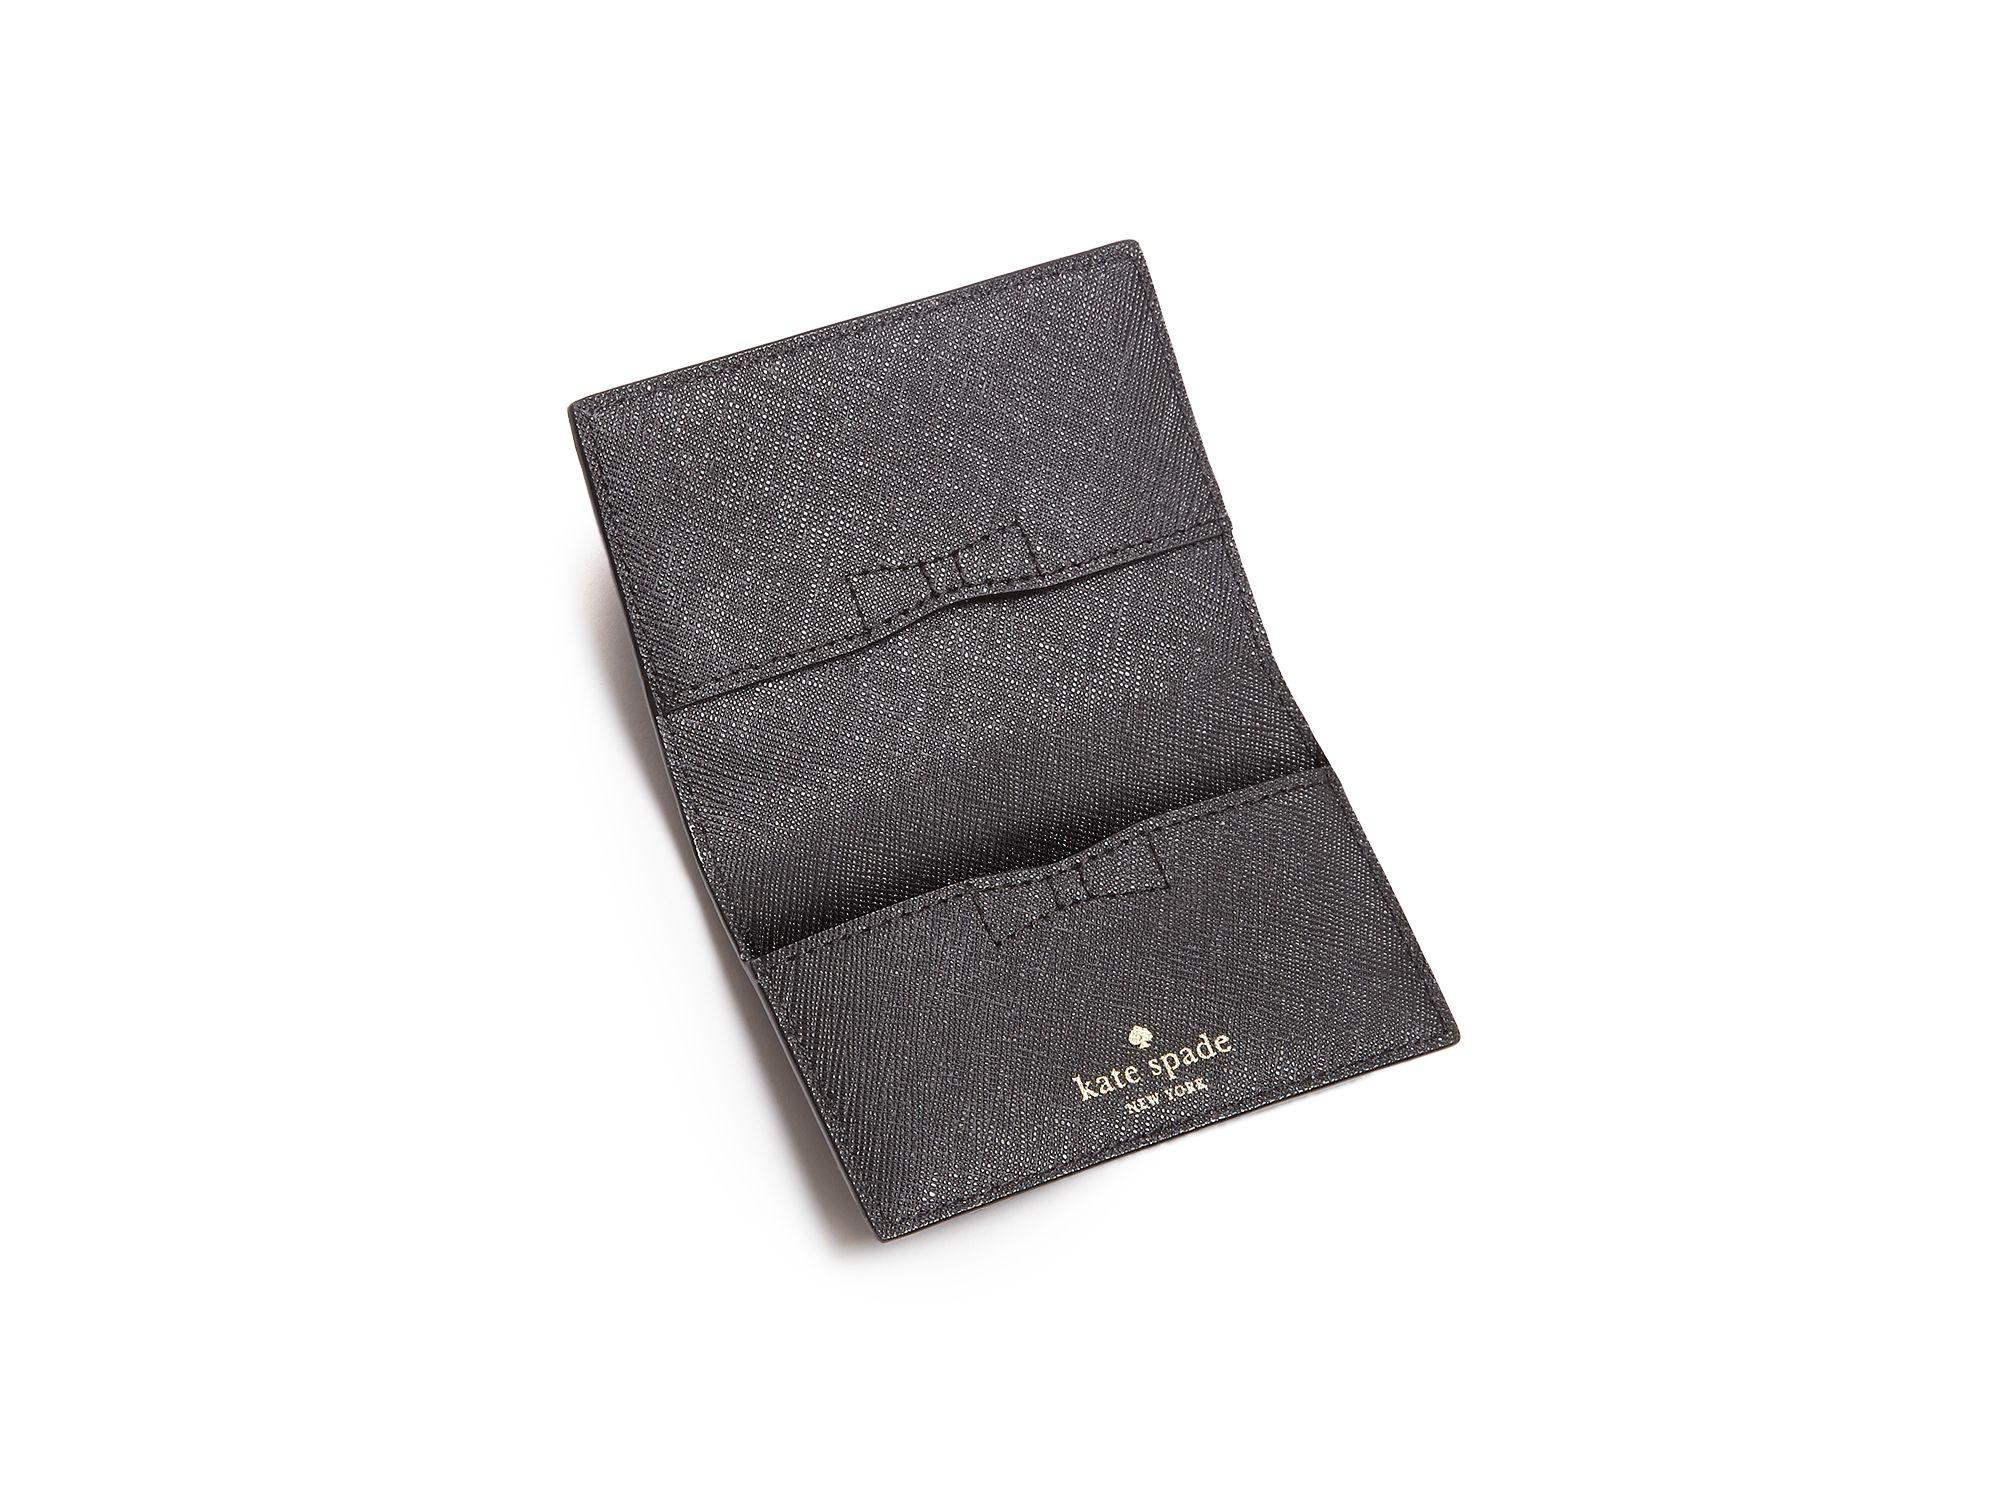 Kate spade new york black cedar street melanie card case product 1 702640728 normal